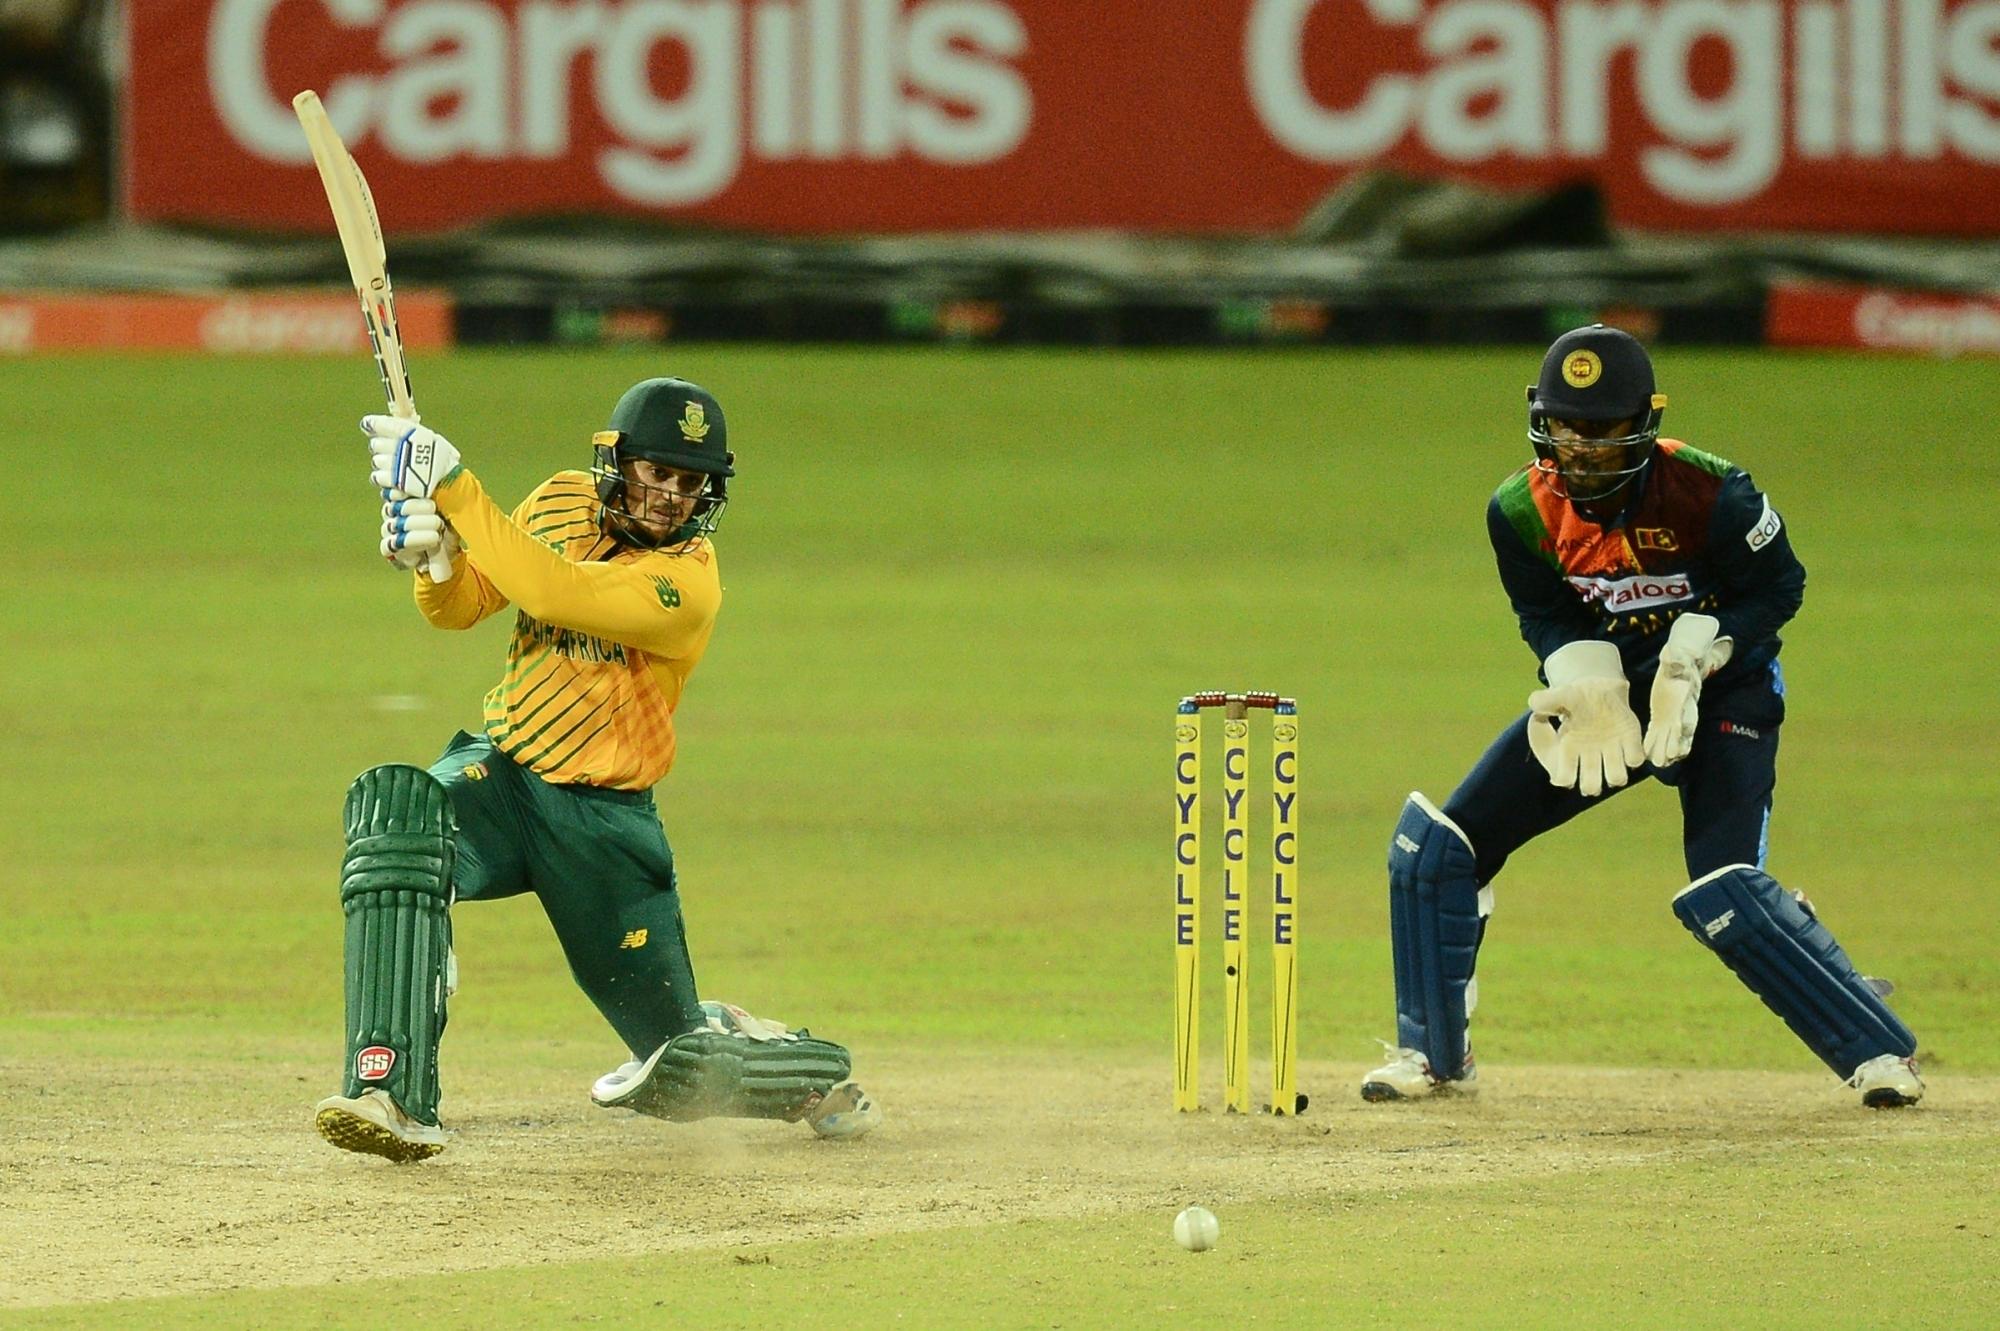 SA's Quinton de Kock breaks into top-10 of T20I rankings for batsmen